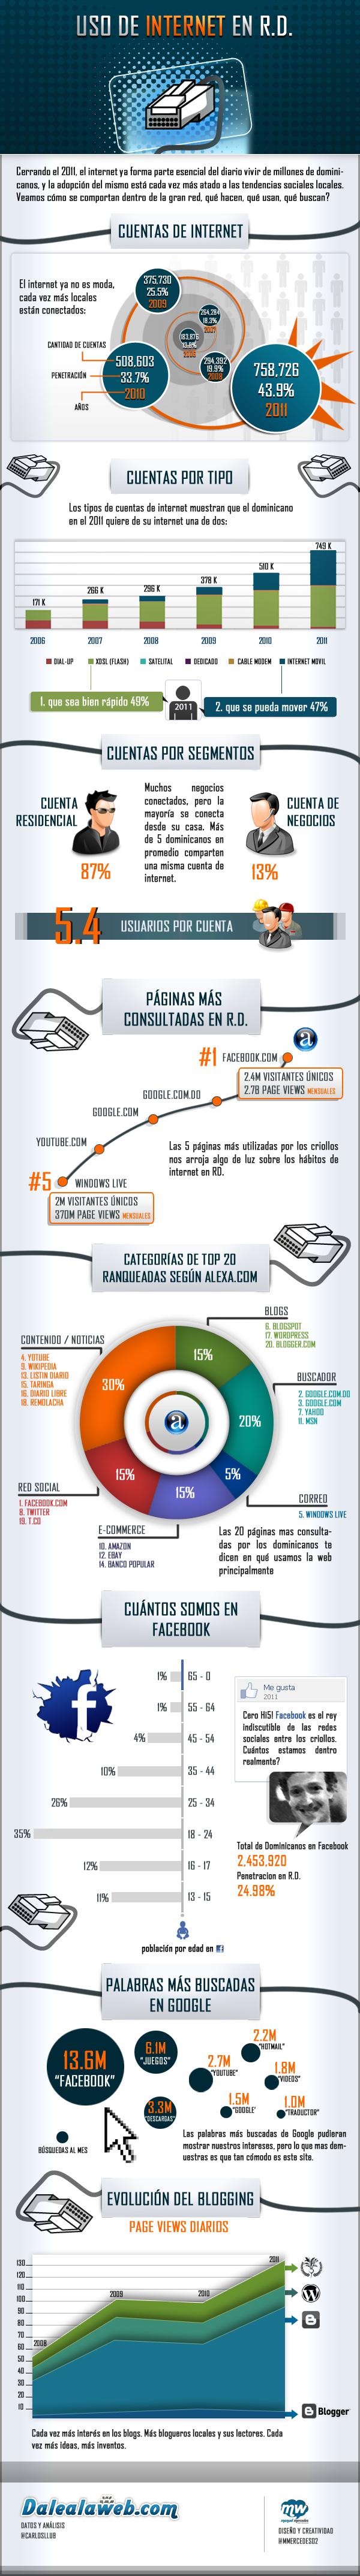 infografia-uso-del-internet-en-la-republica-dominicana-dalealaweb